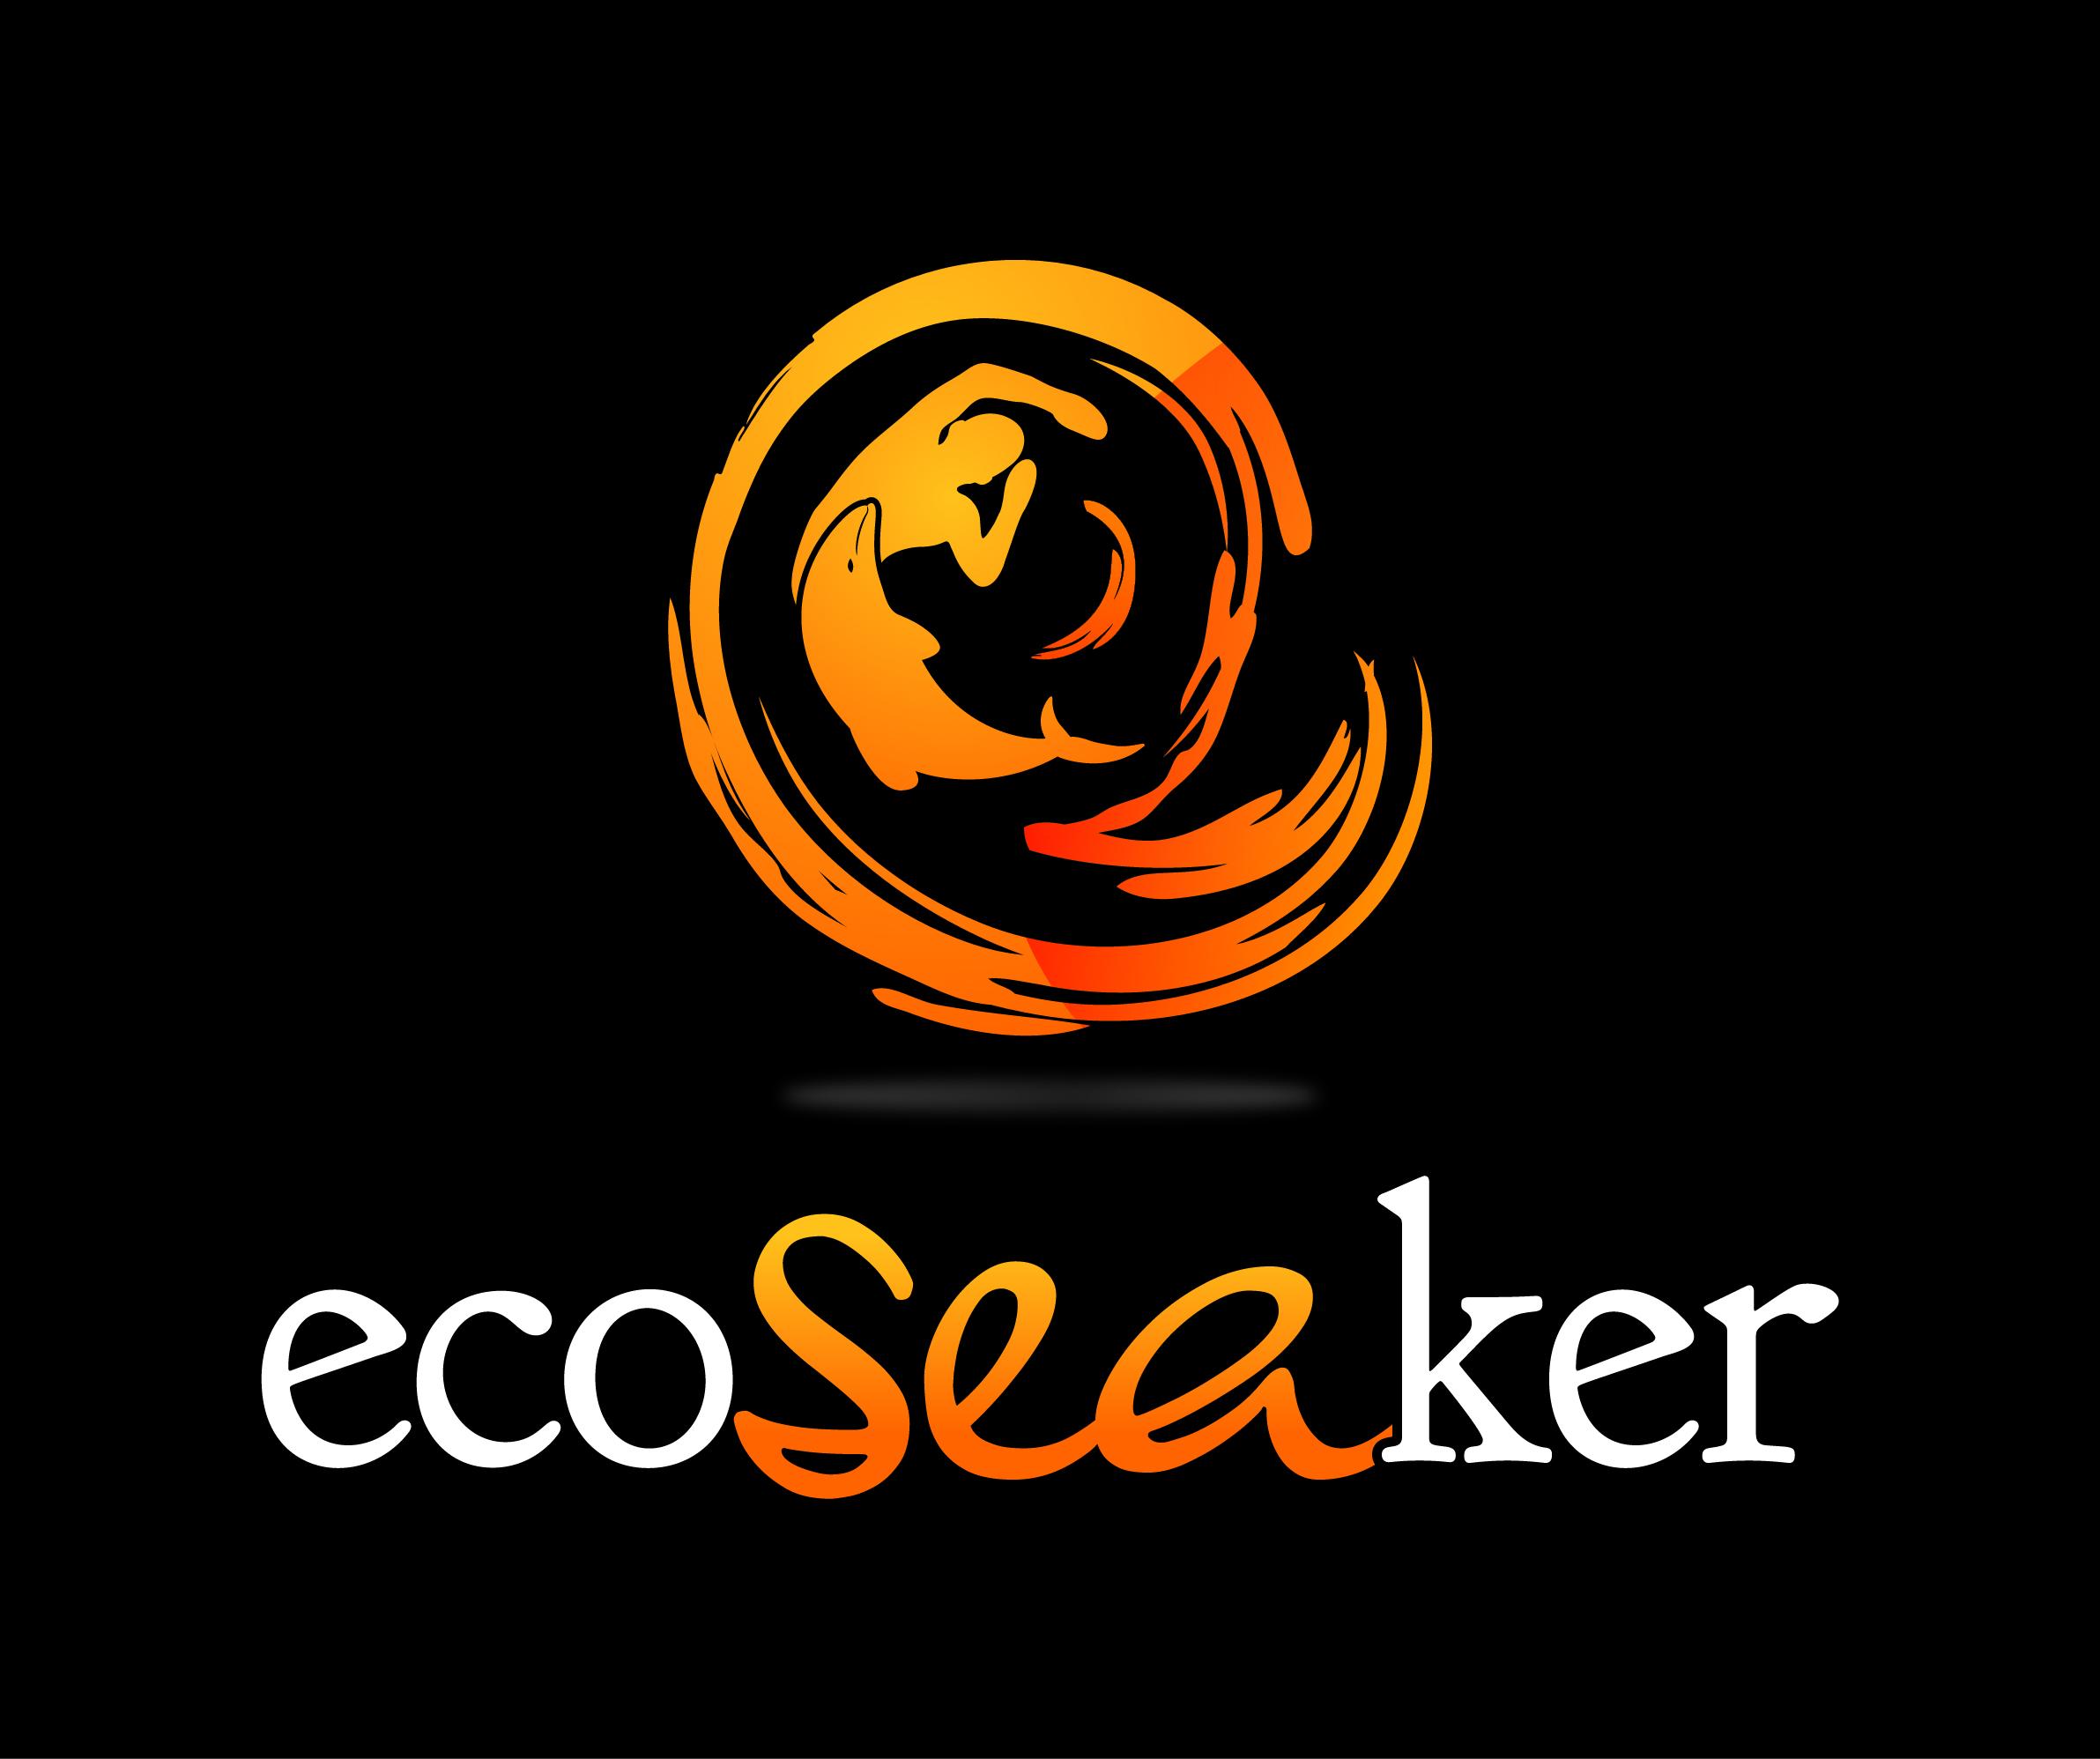 ecoseaker logo